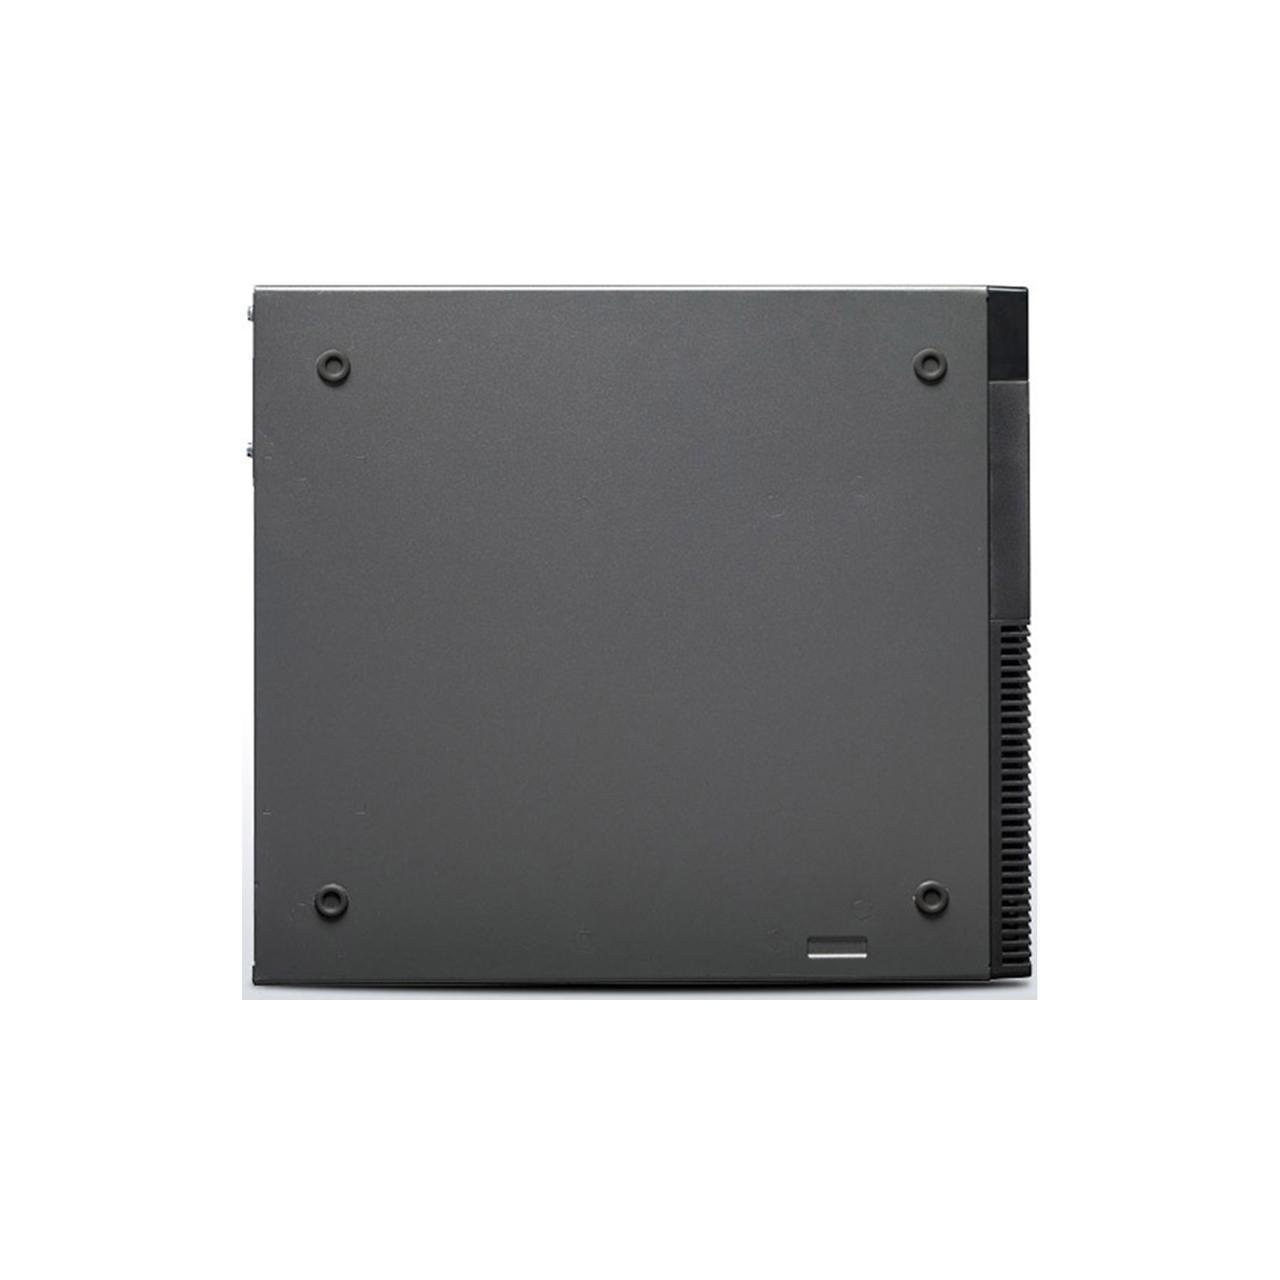 Lenovo Thinkcentre M93P Core i5 3.2 GHz - HDD 500 GB RAM 8GB